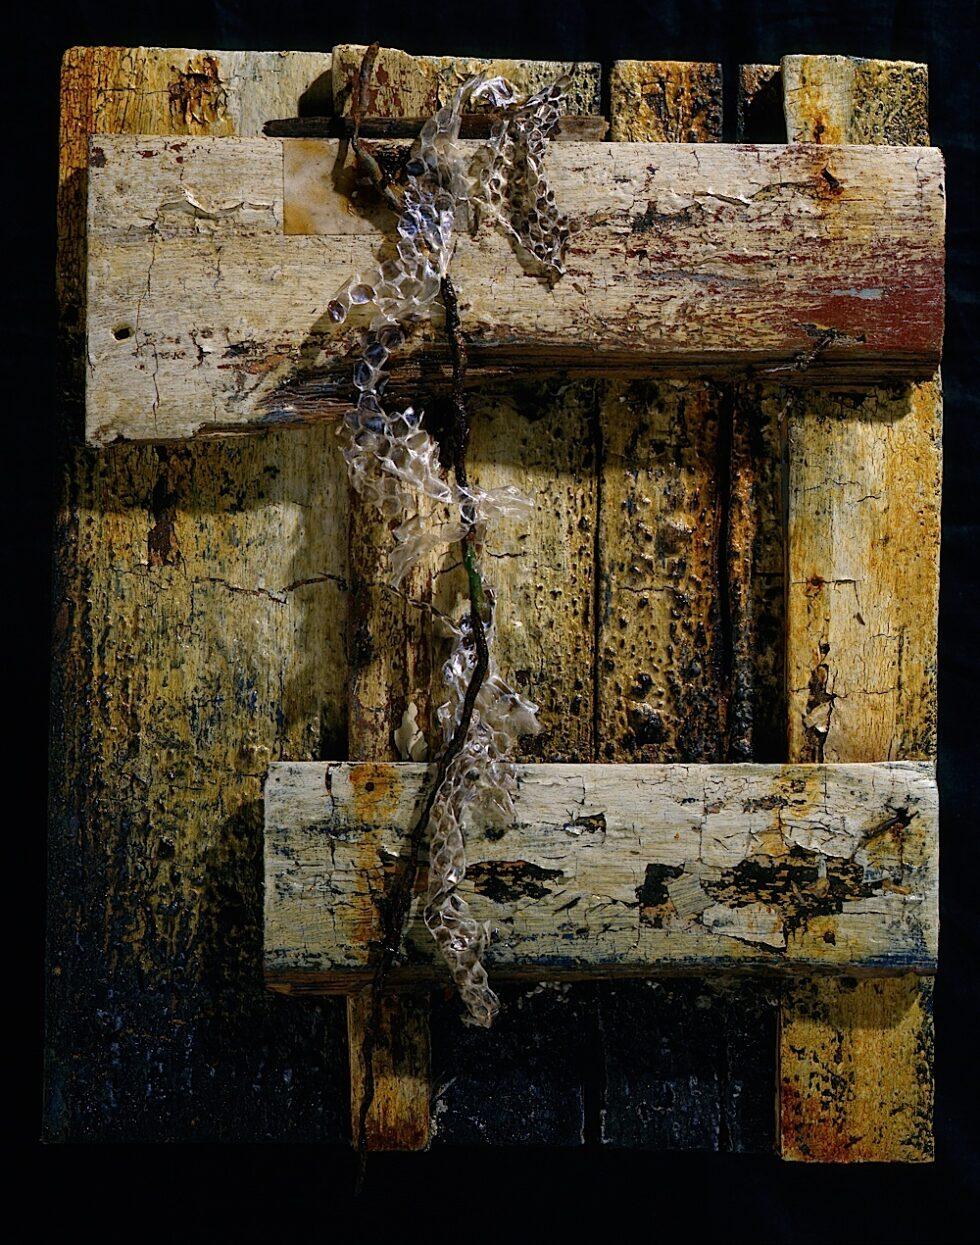 Memory's Wound 1997 (towards Closure)